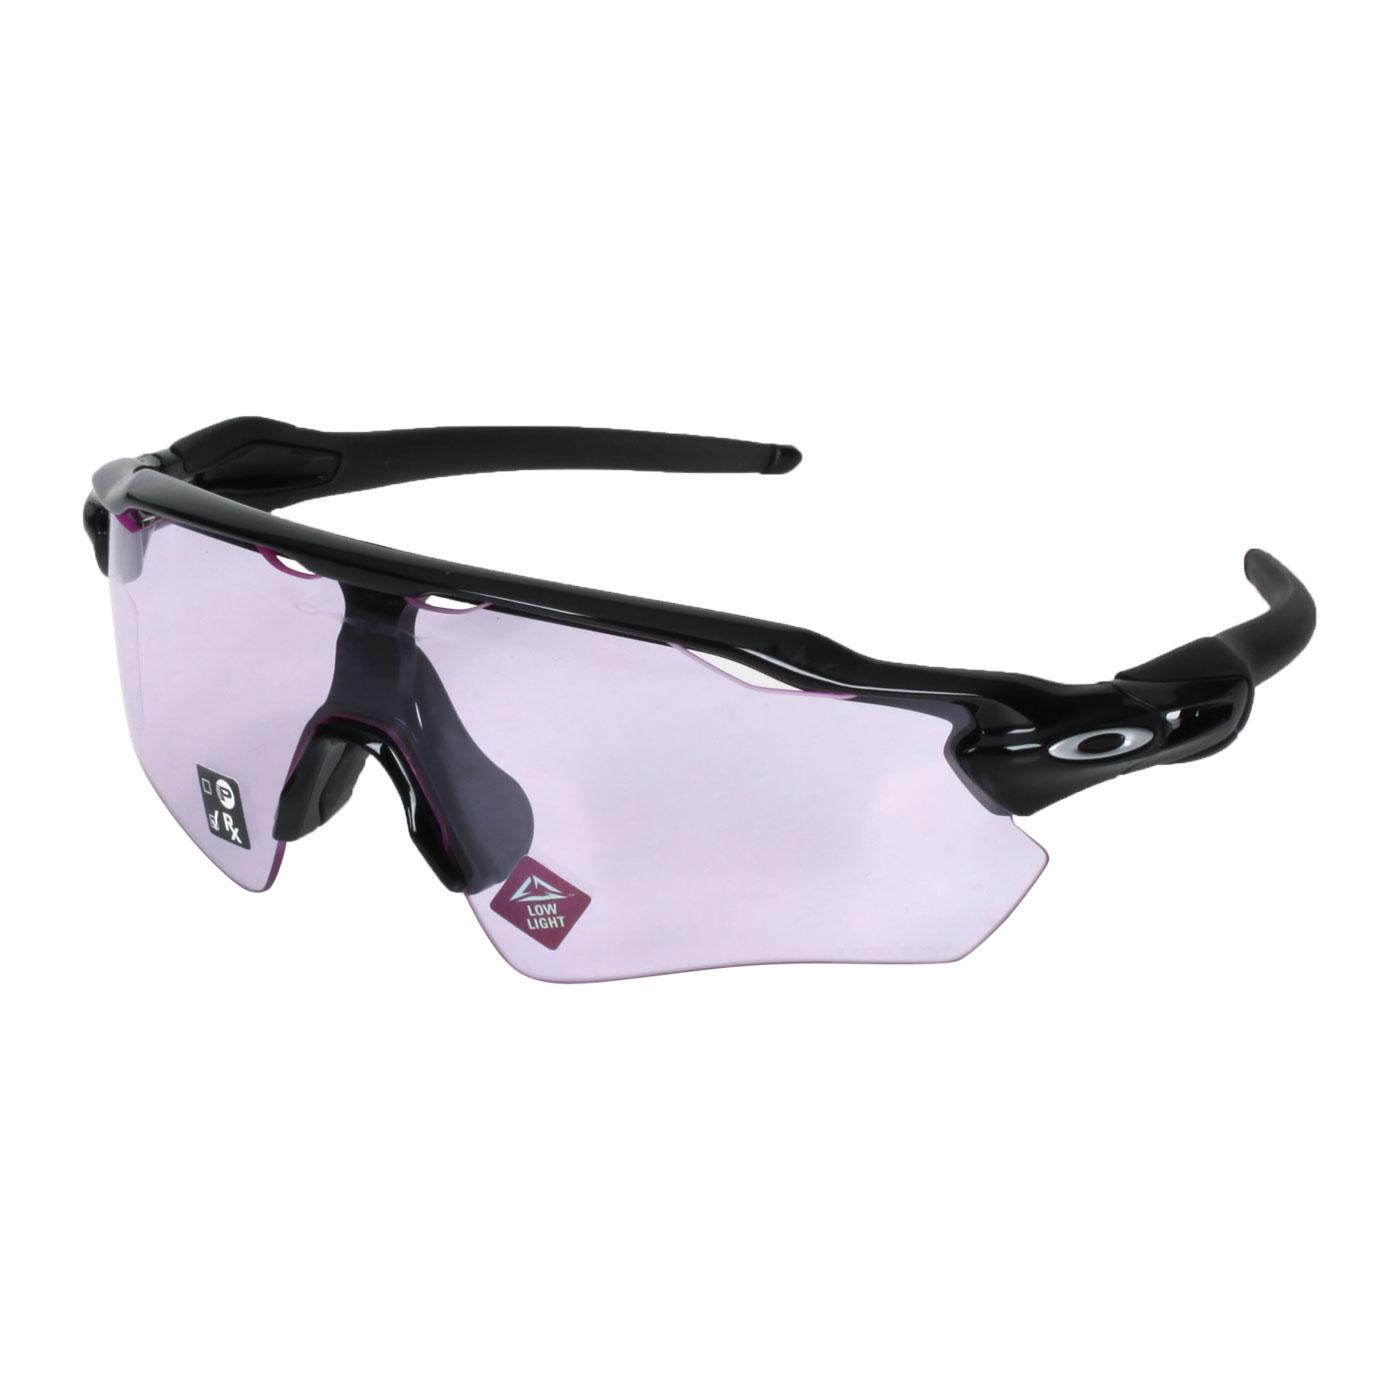 OAKLEY RADAR EV PATH 一般太陽眼鏡(附硬盒鼻墊) OAK-OO9208-9838 - 黑銀